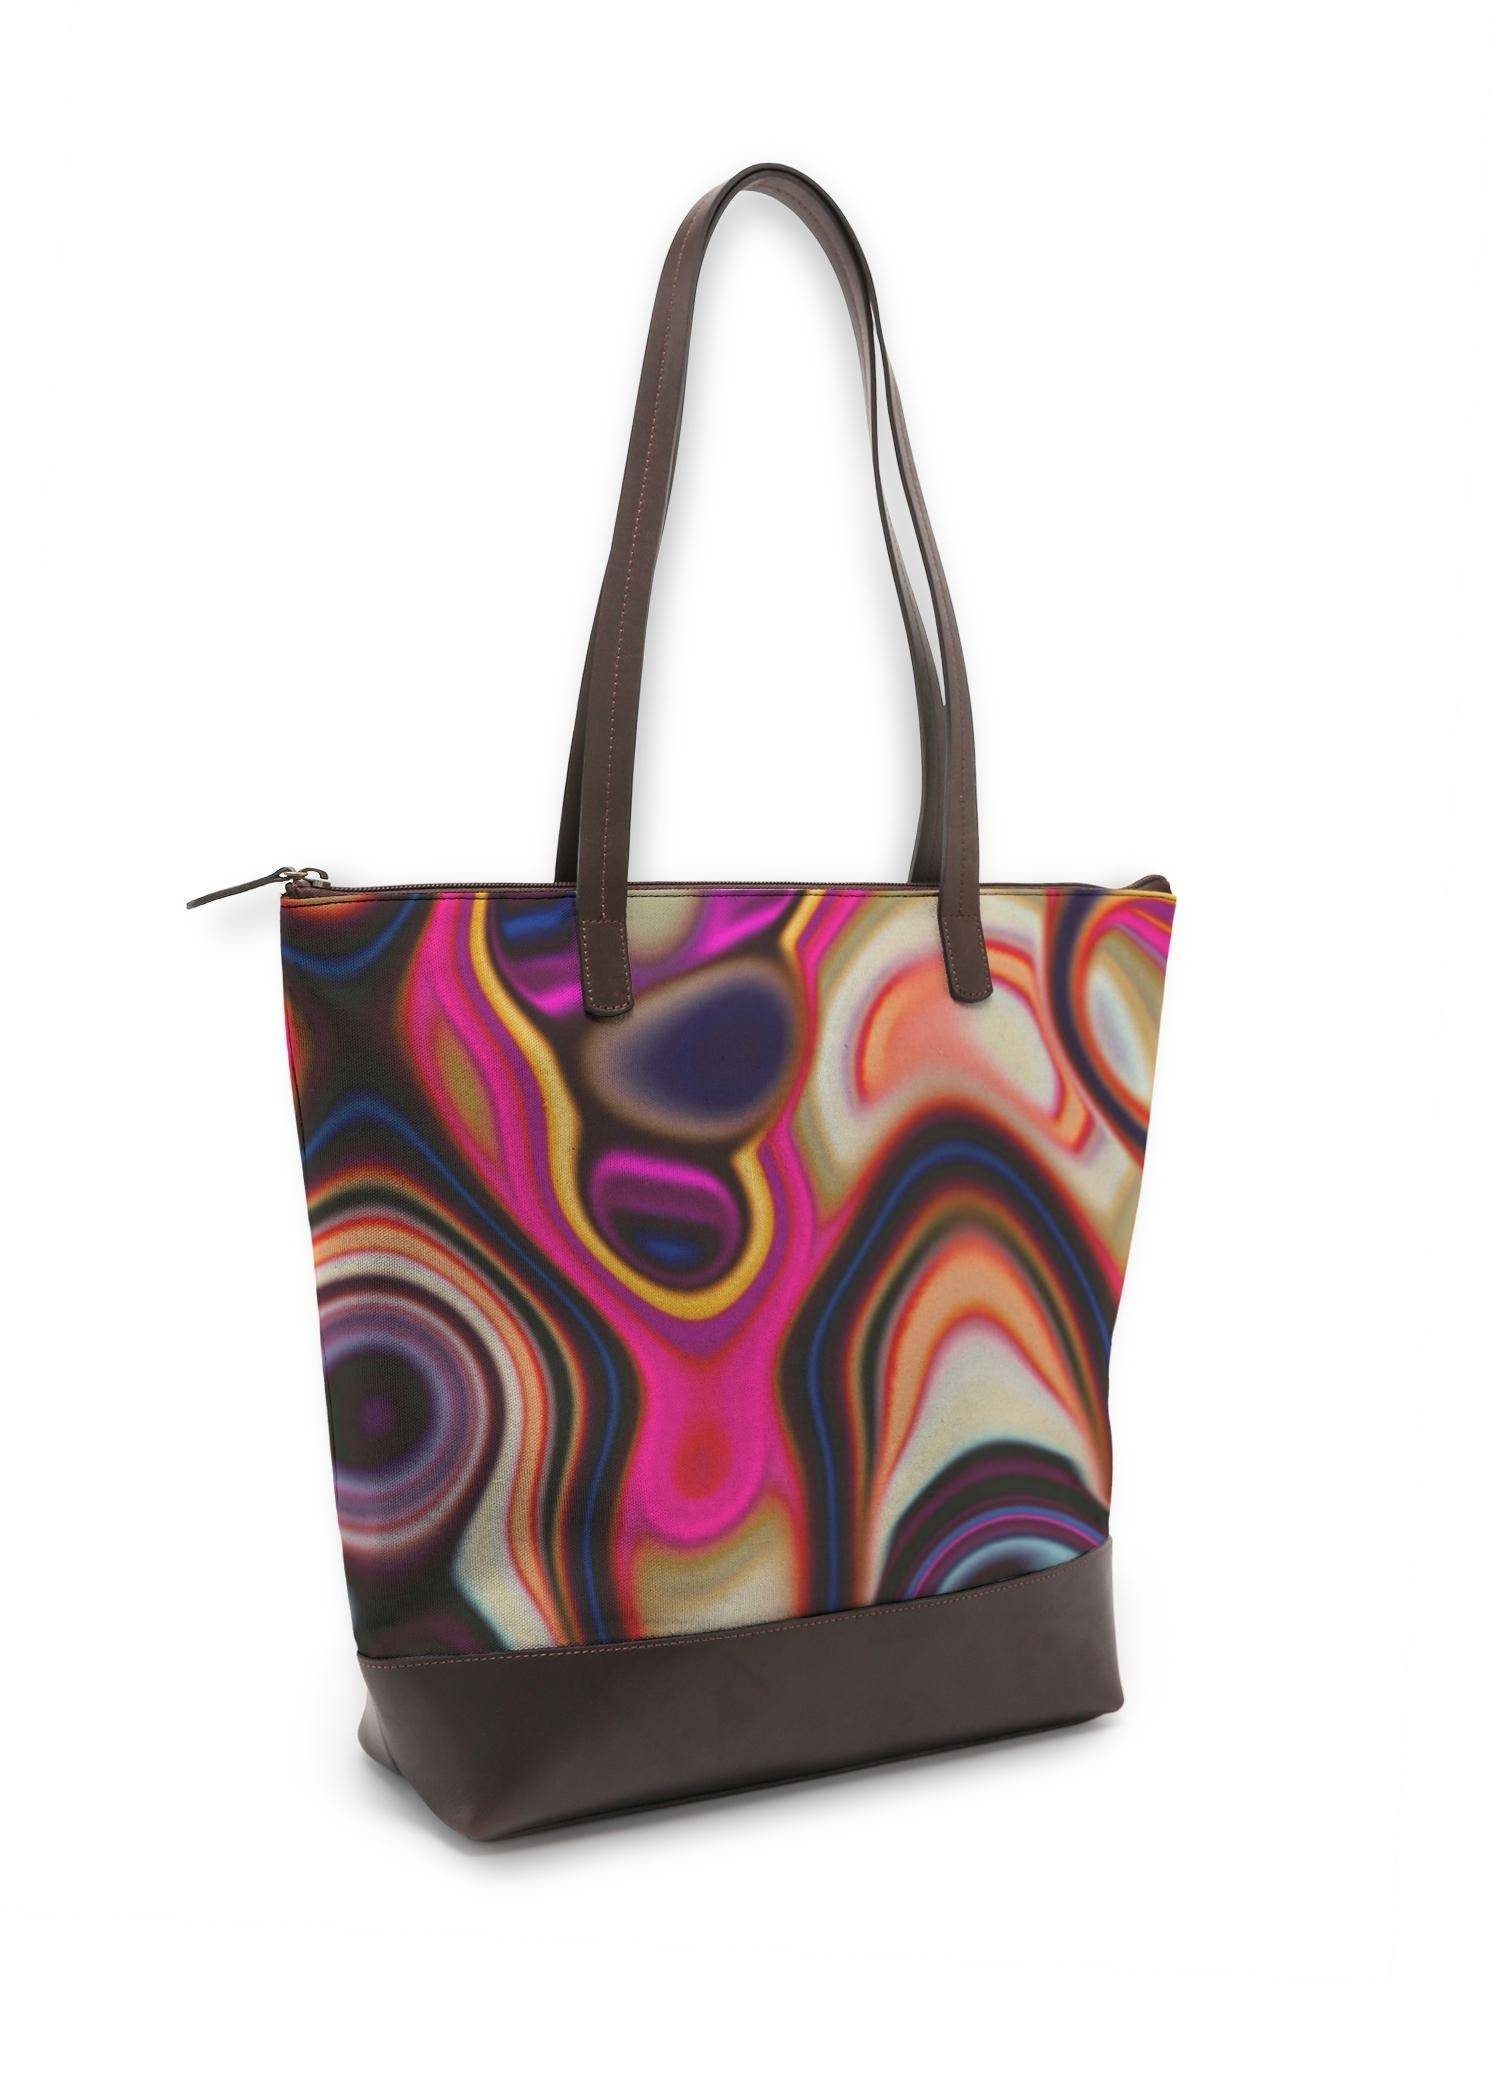 VIDA Statement Bag - Fashion Background 2 by VIDA Original Artist  - Size: One Size